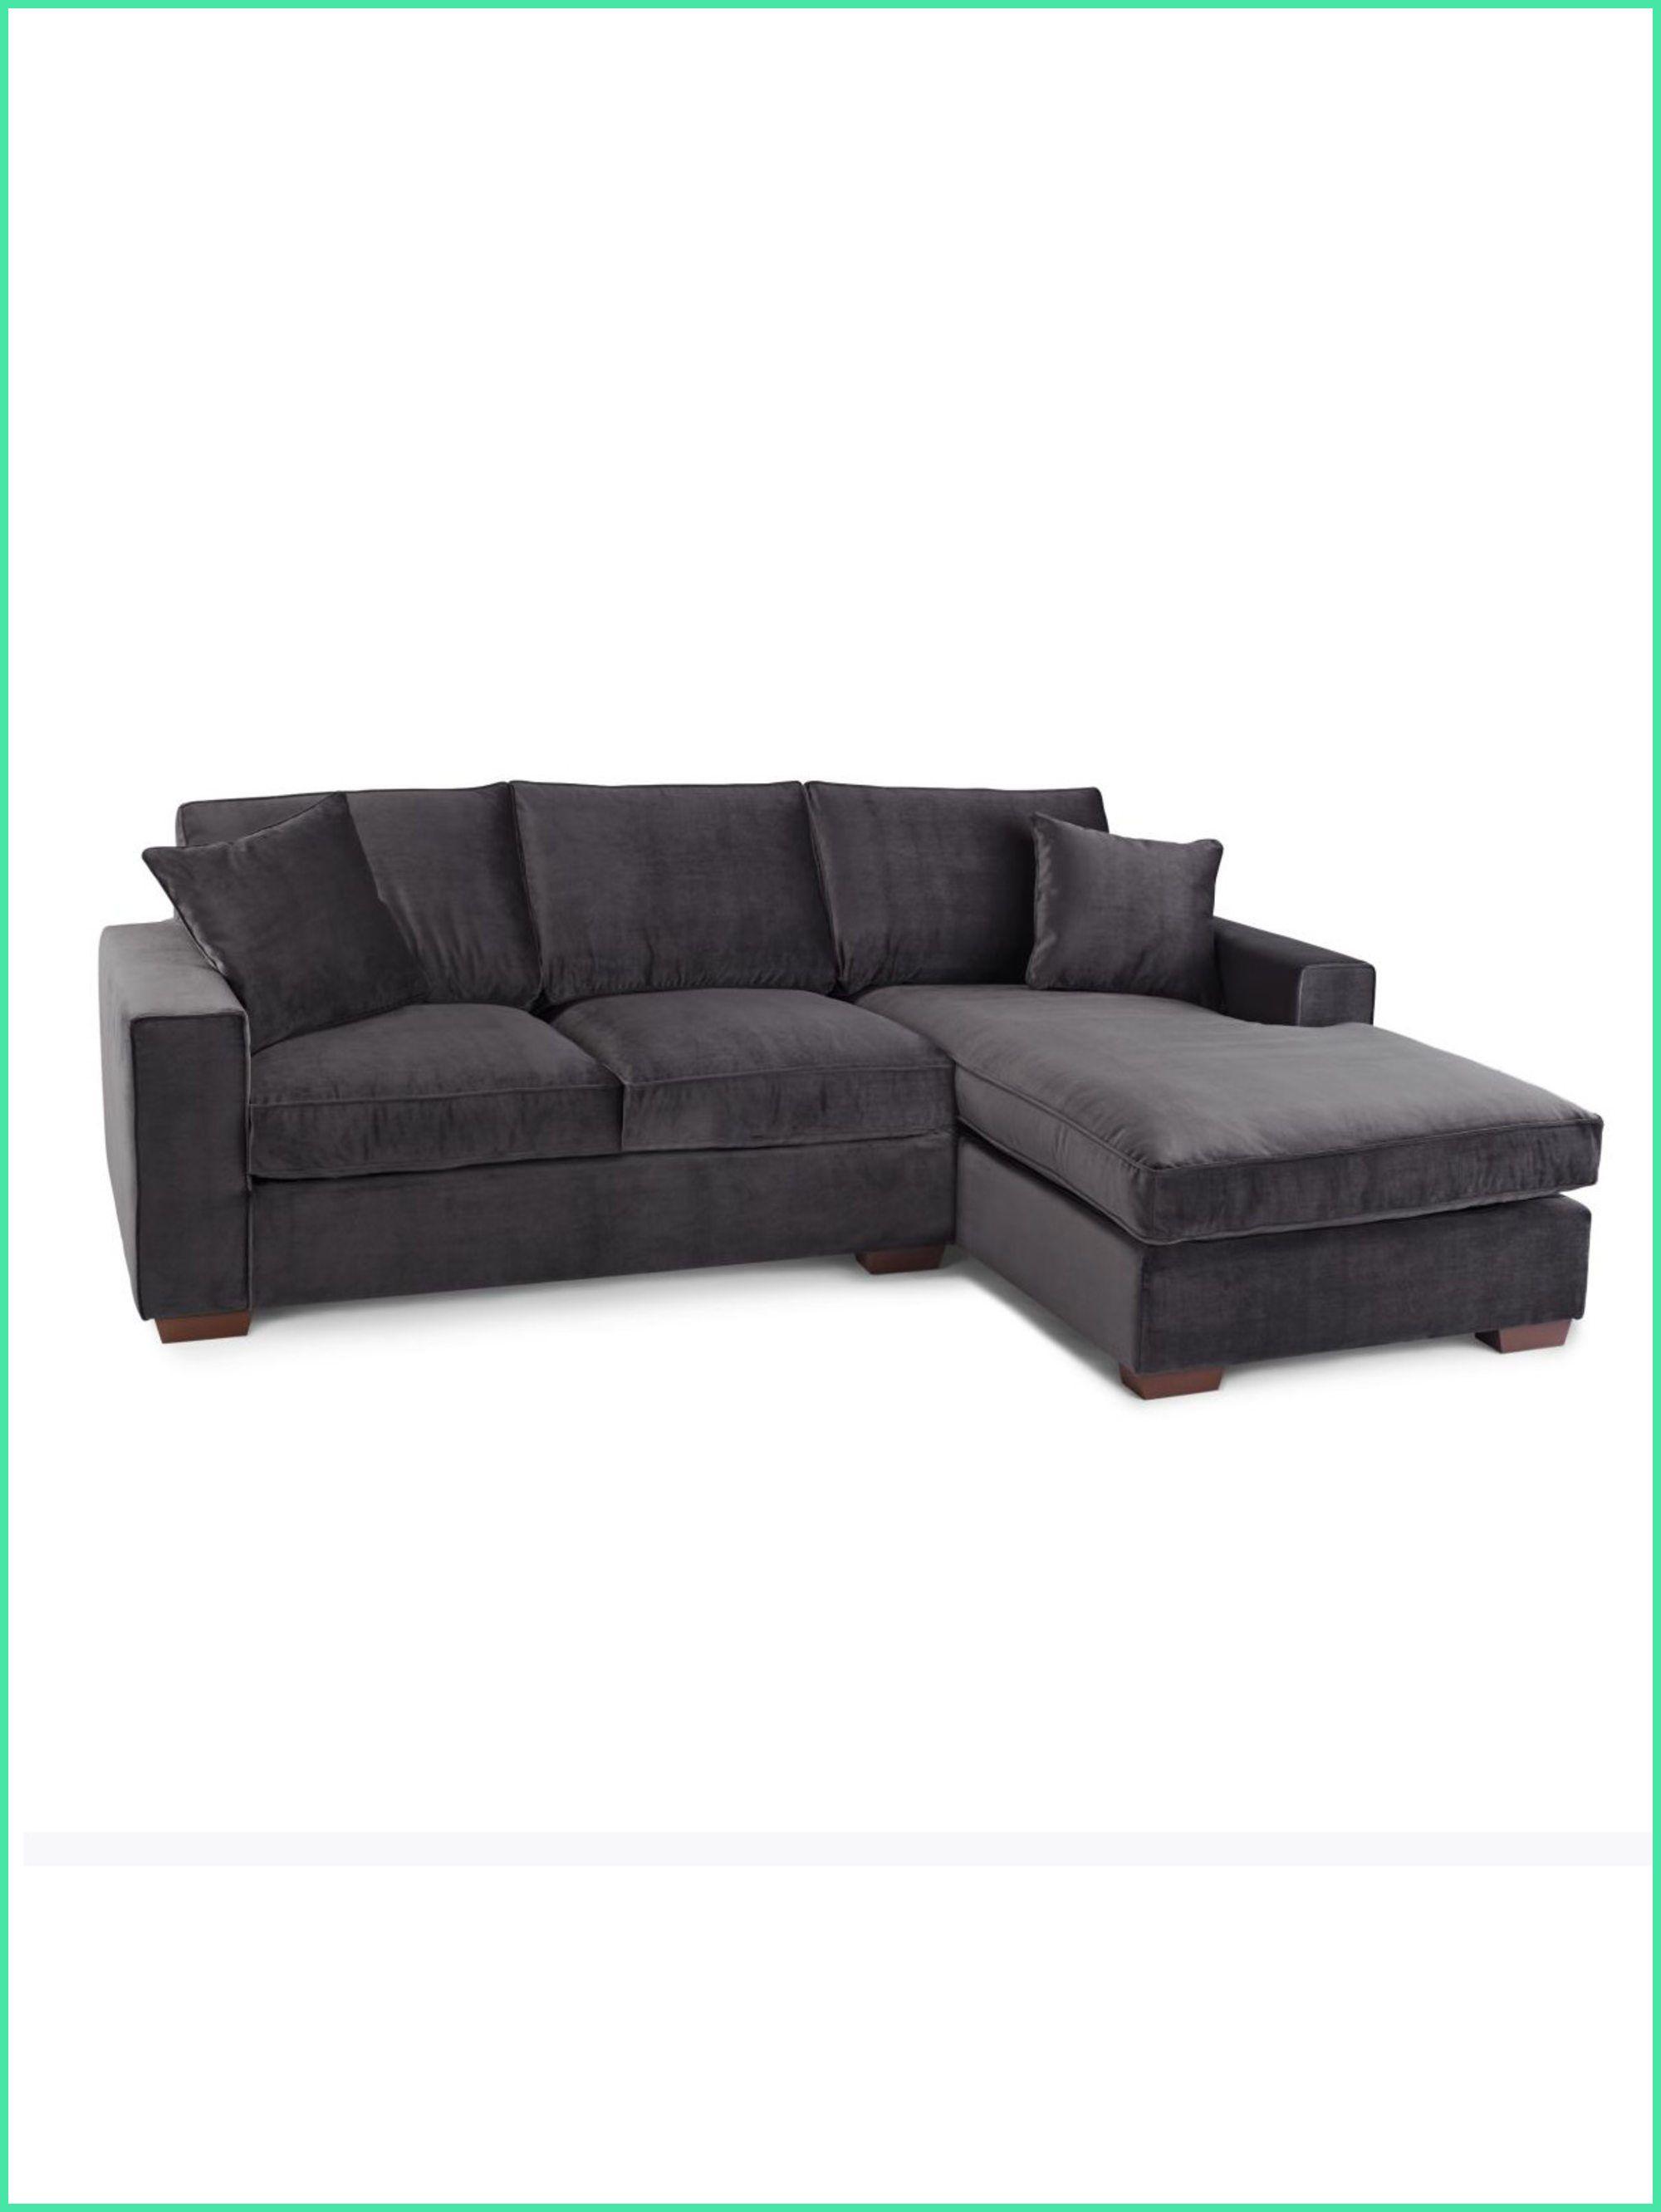 15 Primary Samt Ecksofa Home Decor Couch Decor